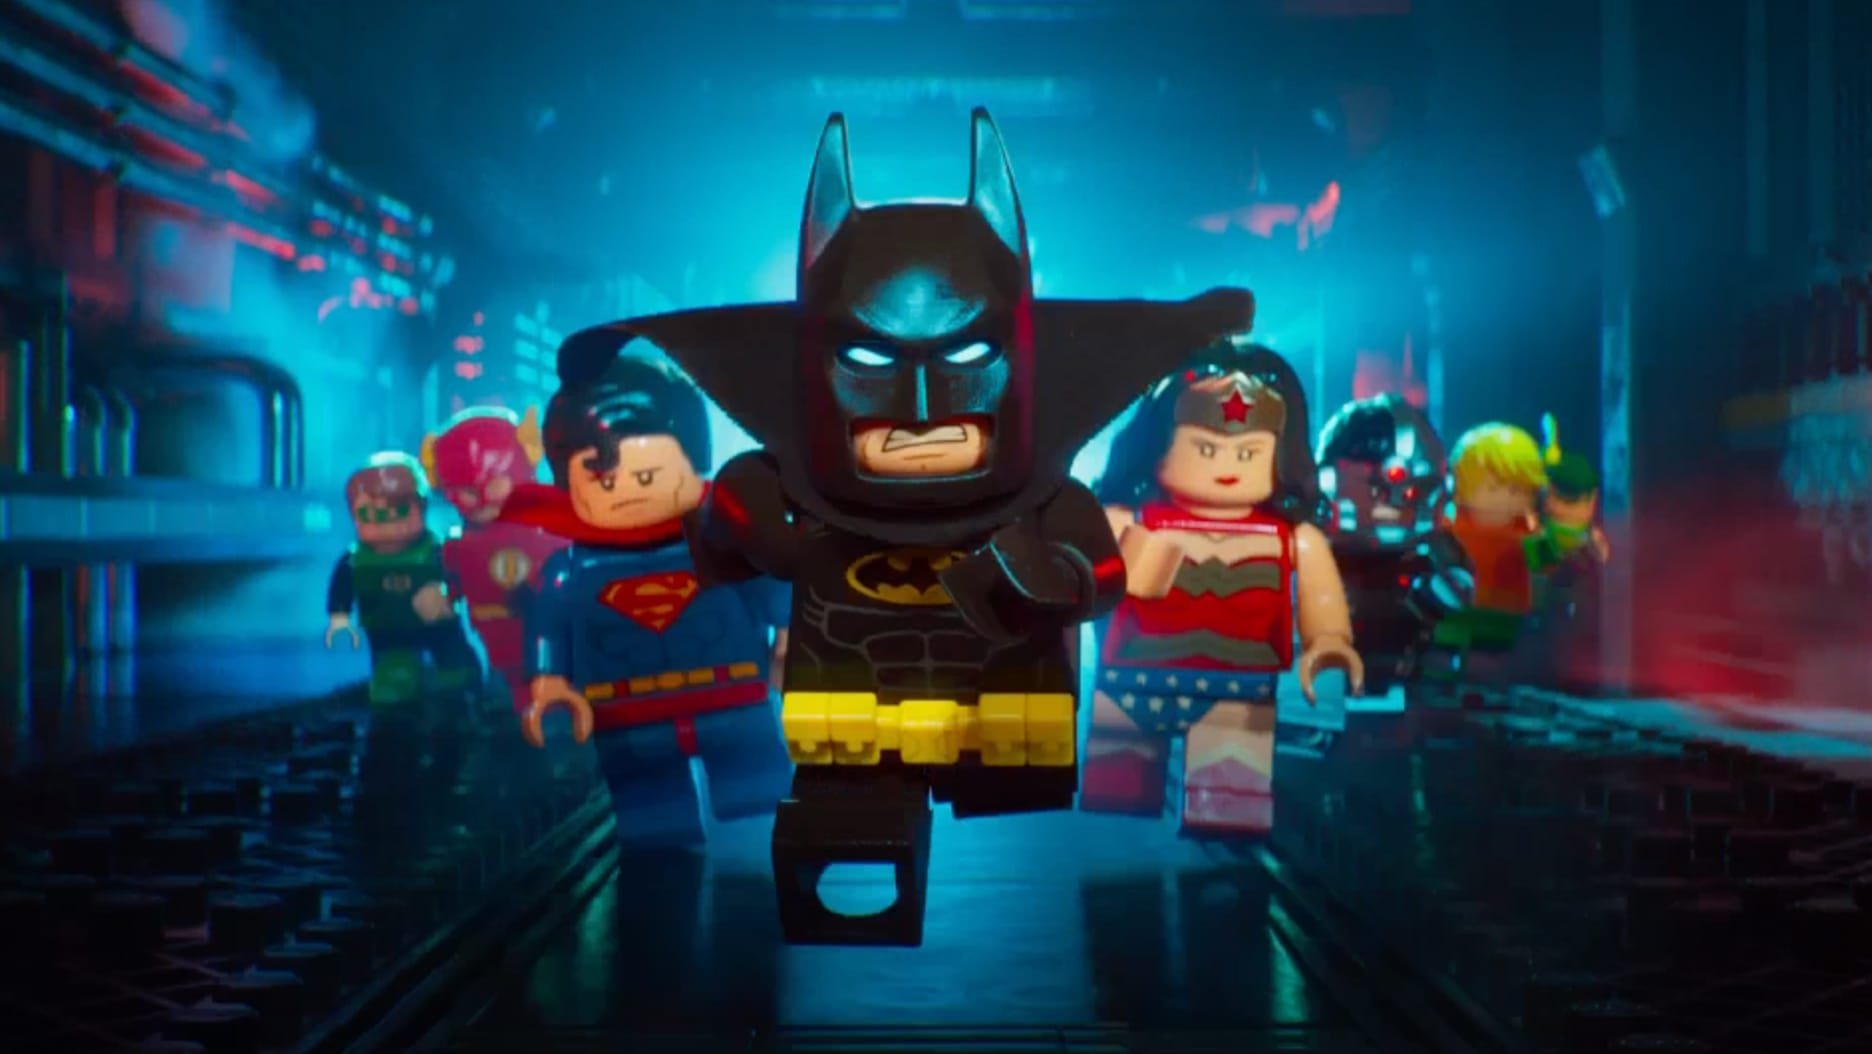 Lego Batman Movie Wallpaper - Lego Batman Movie 2017 , HD Wallpaper & Backgrounds